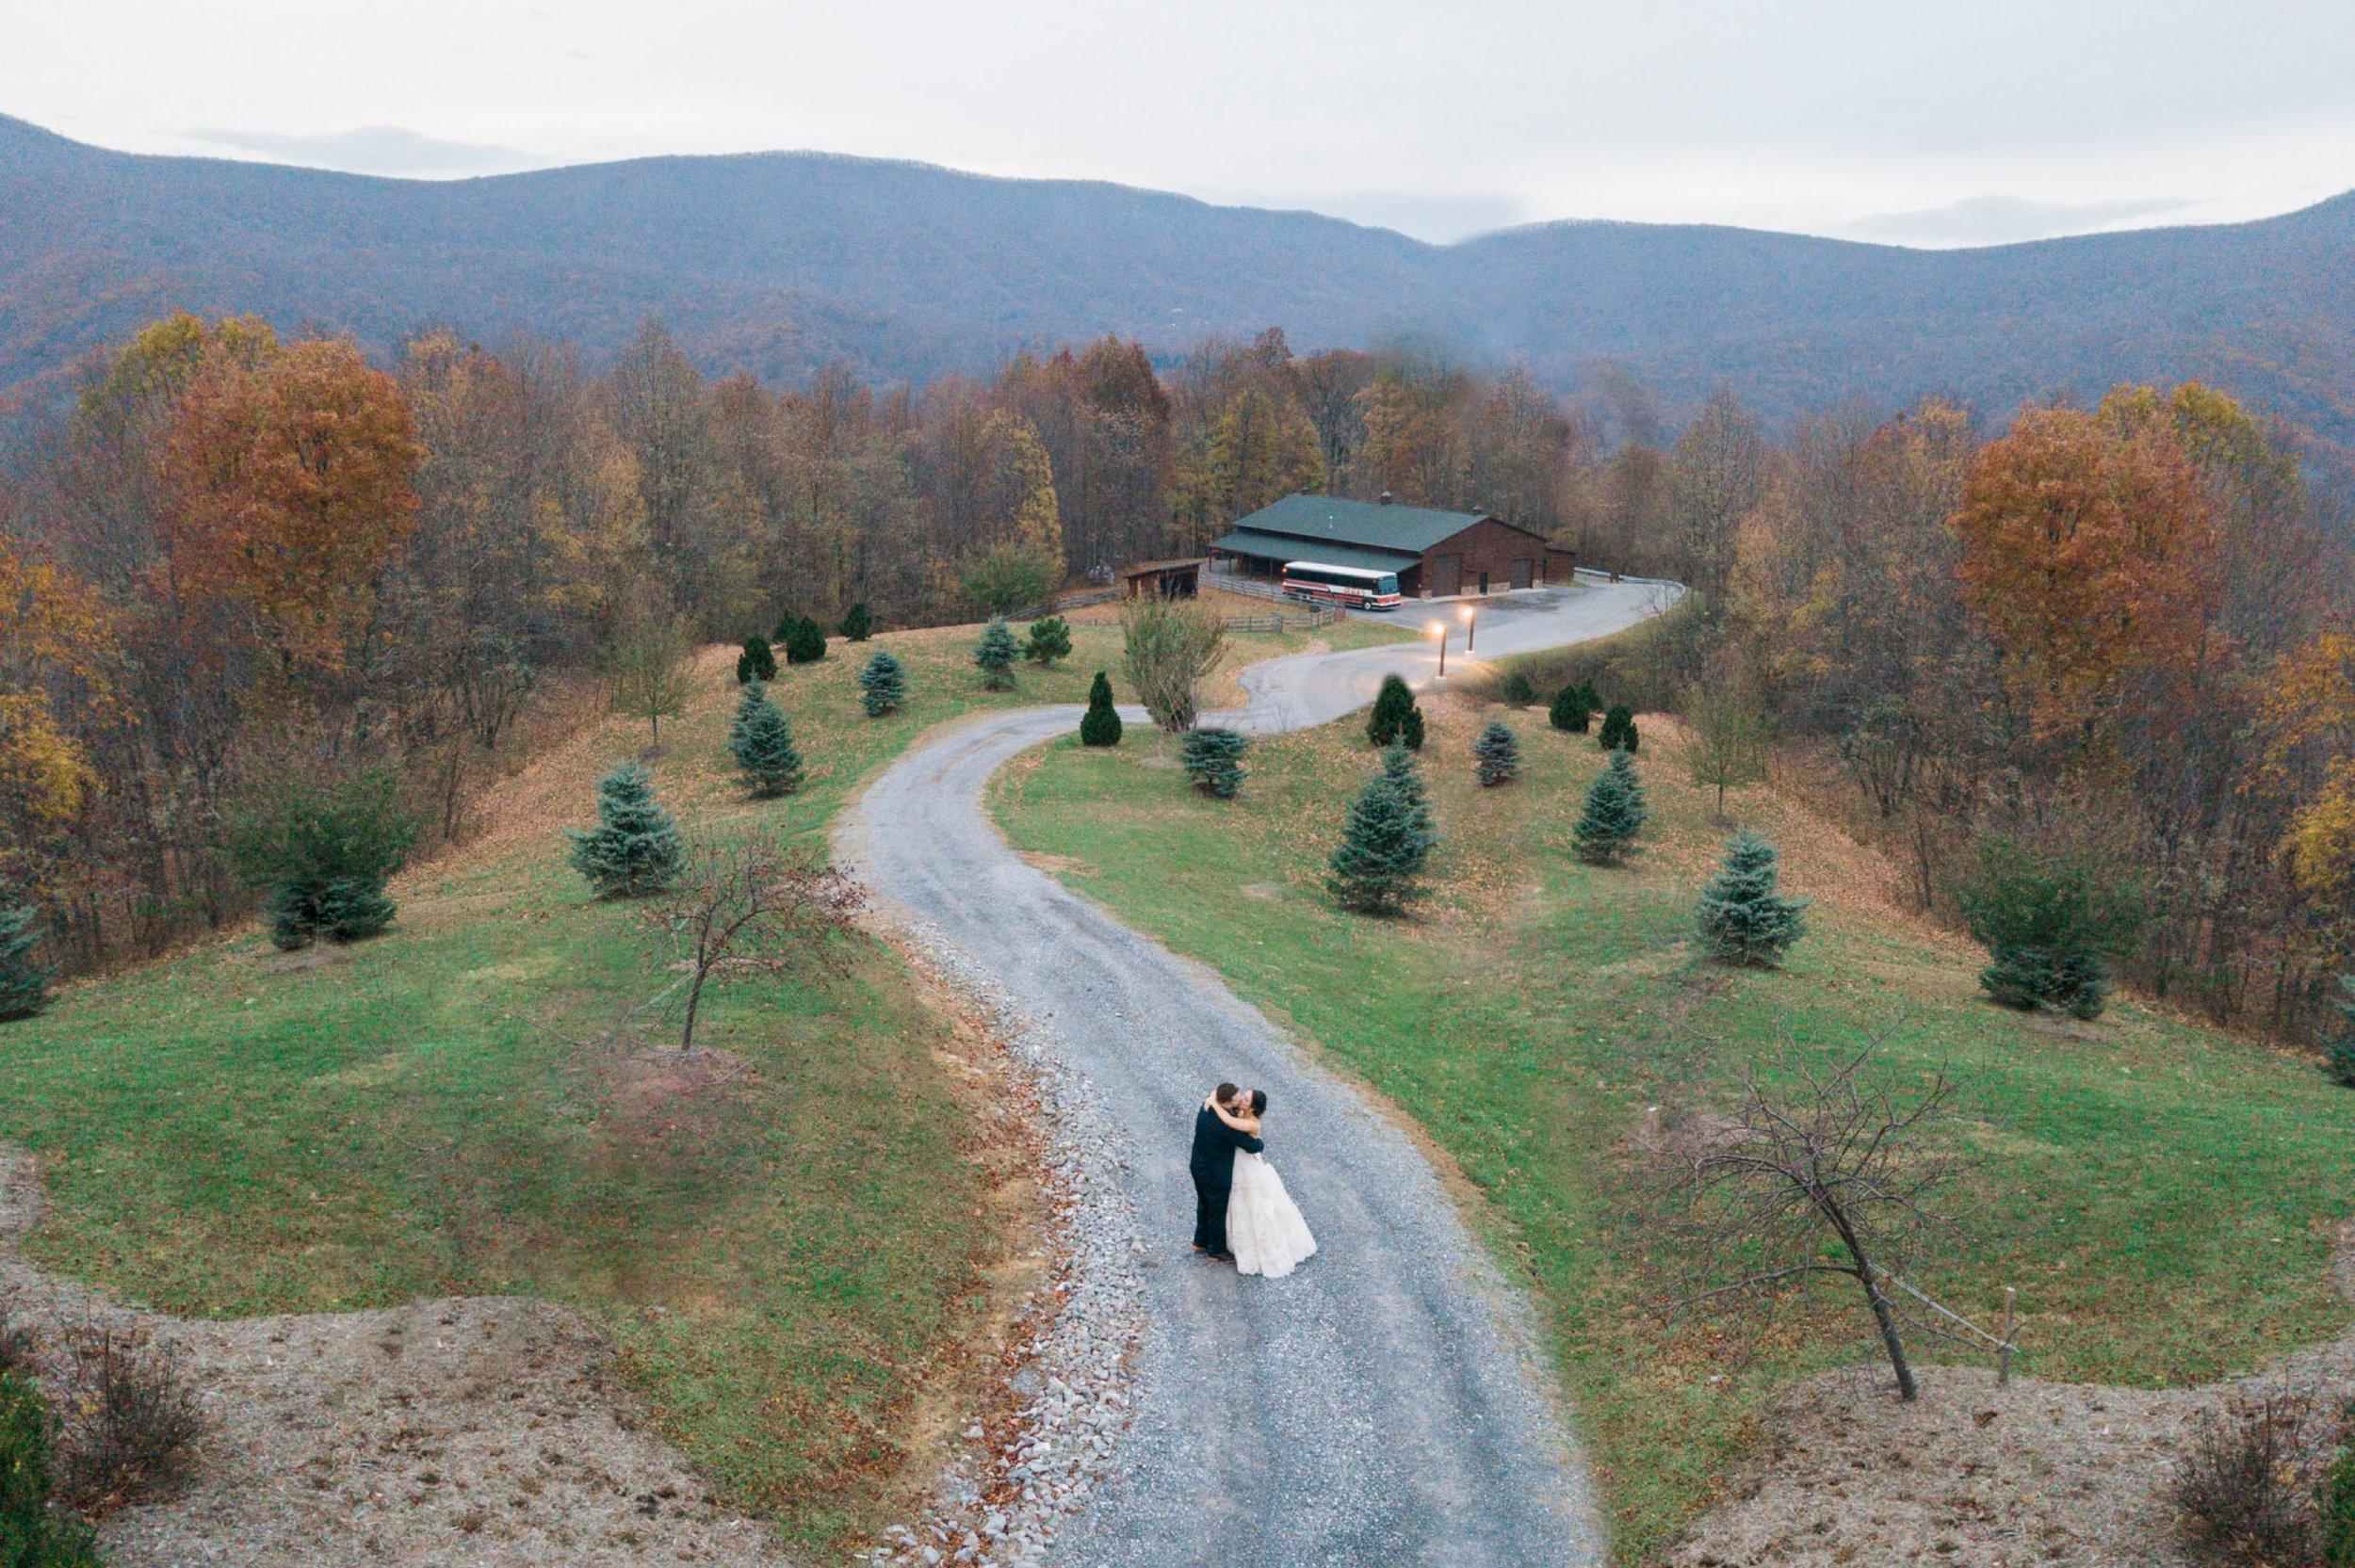 IrvineEstate_LexingtonVA_Wedding_FallWedding_VirginiaWeddingPhotographer 1.jpg